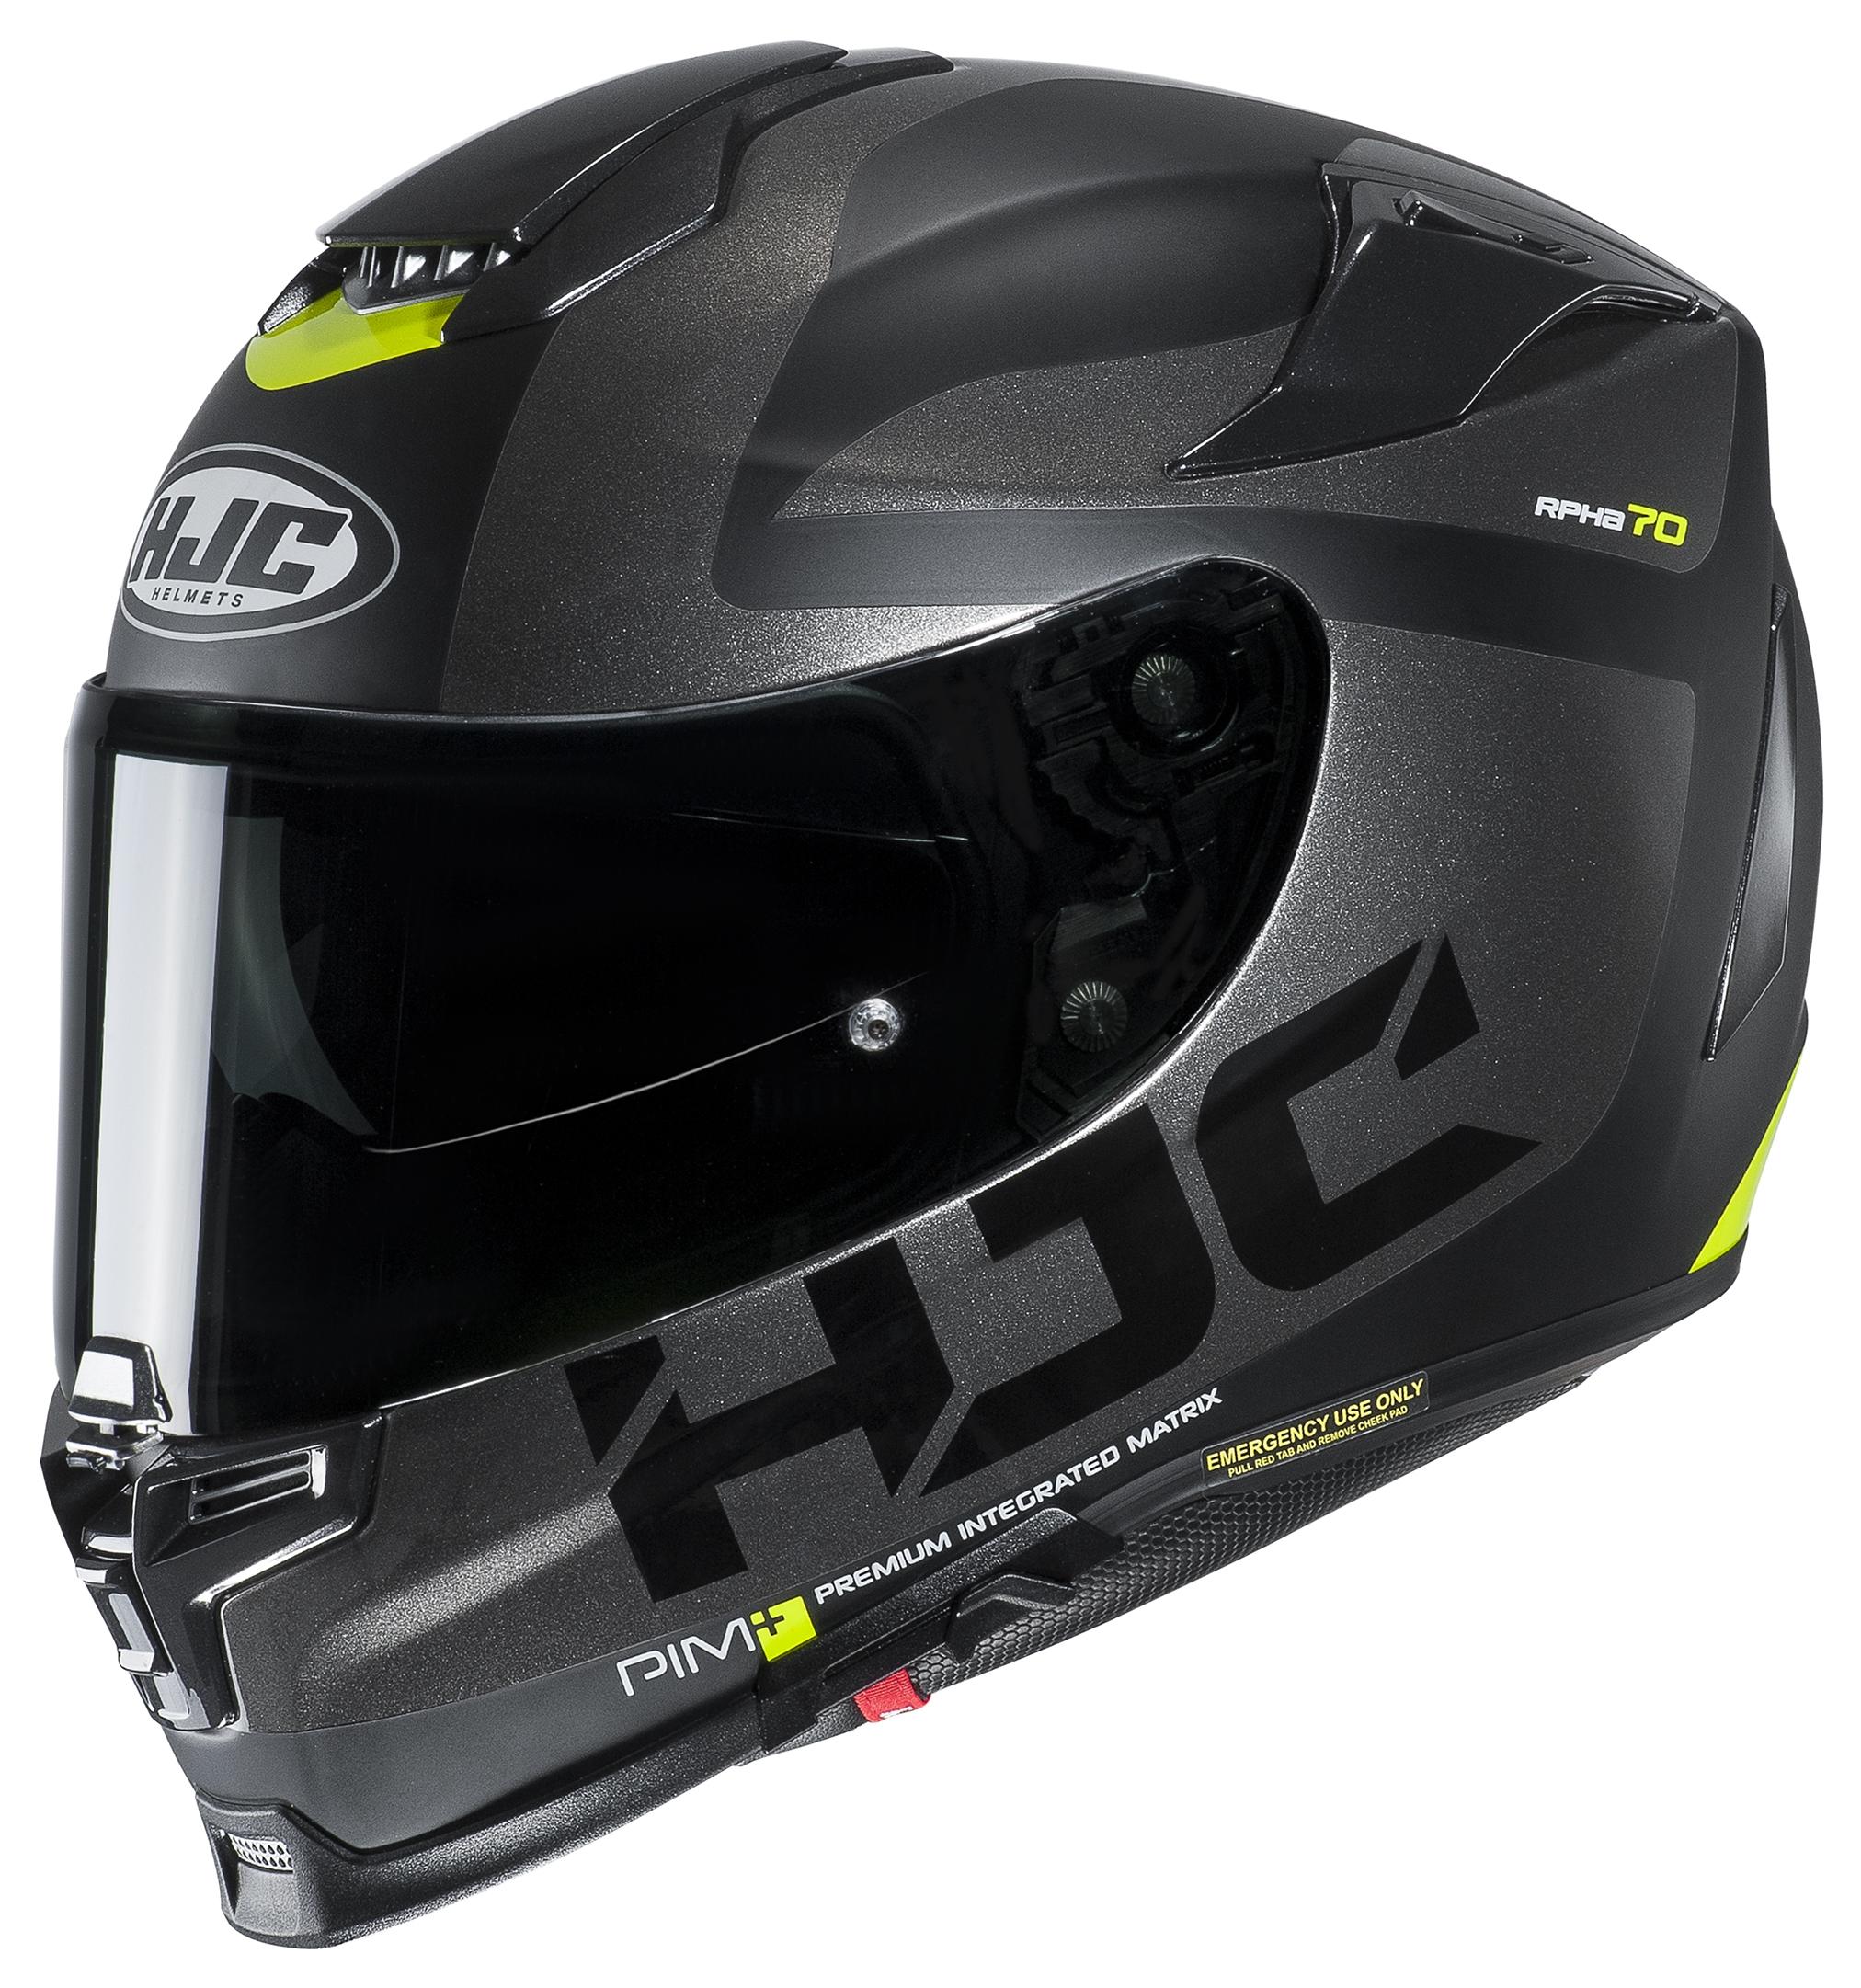 044c1d83 HJC RPHA 70 ST Balius Helmet - Cycle Gear